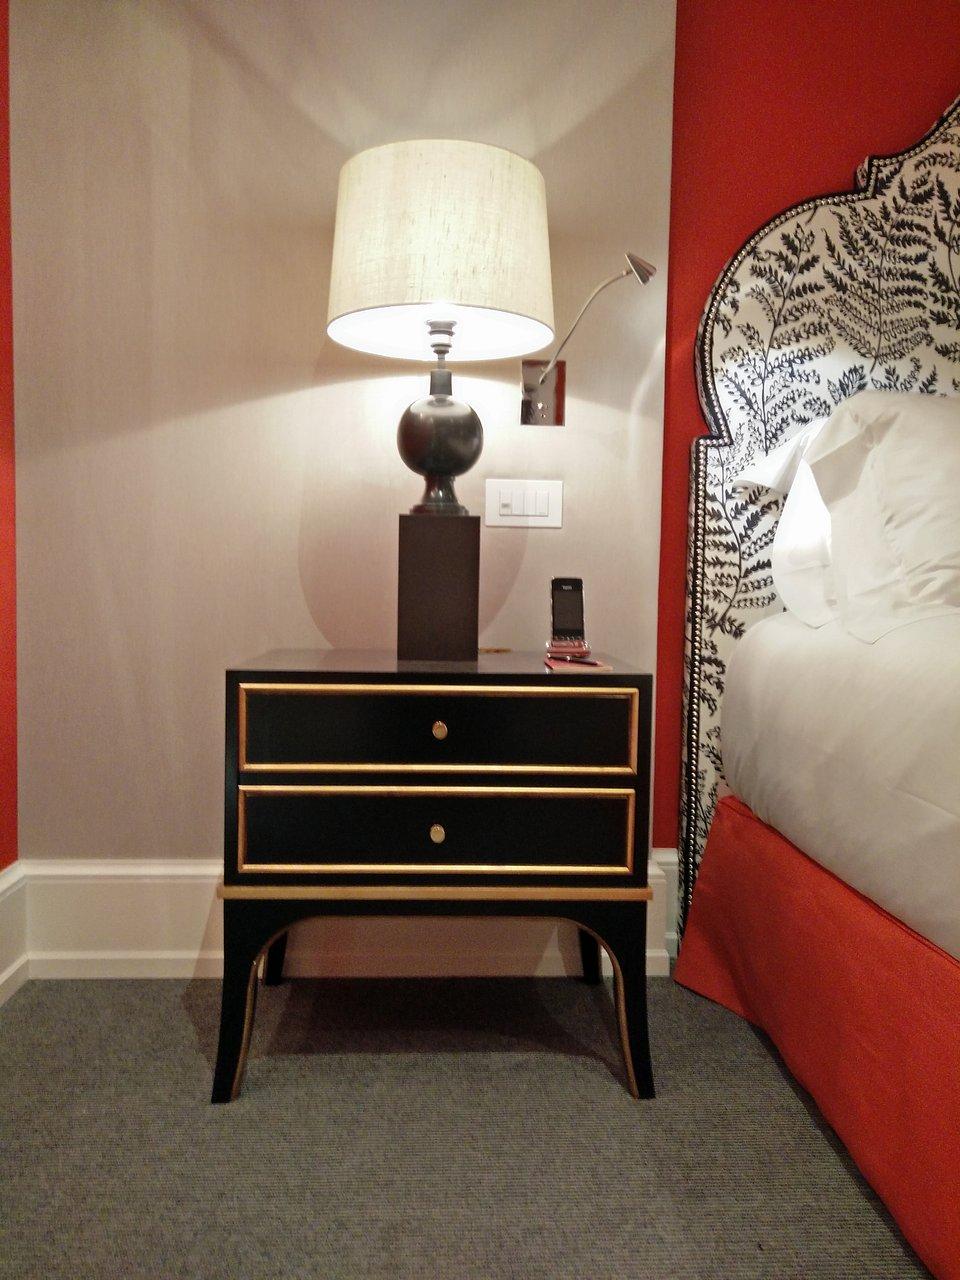 Maalot Hotel_Rome_Bedroom by RPM PROGET (1).jpg